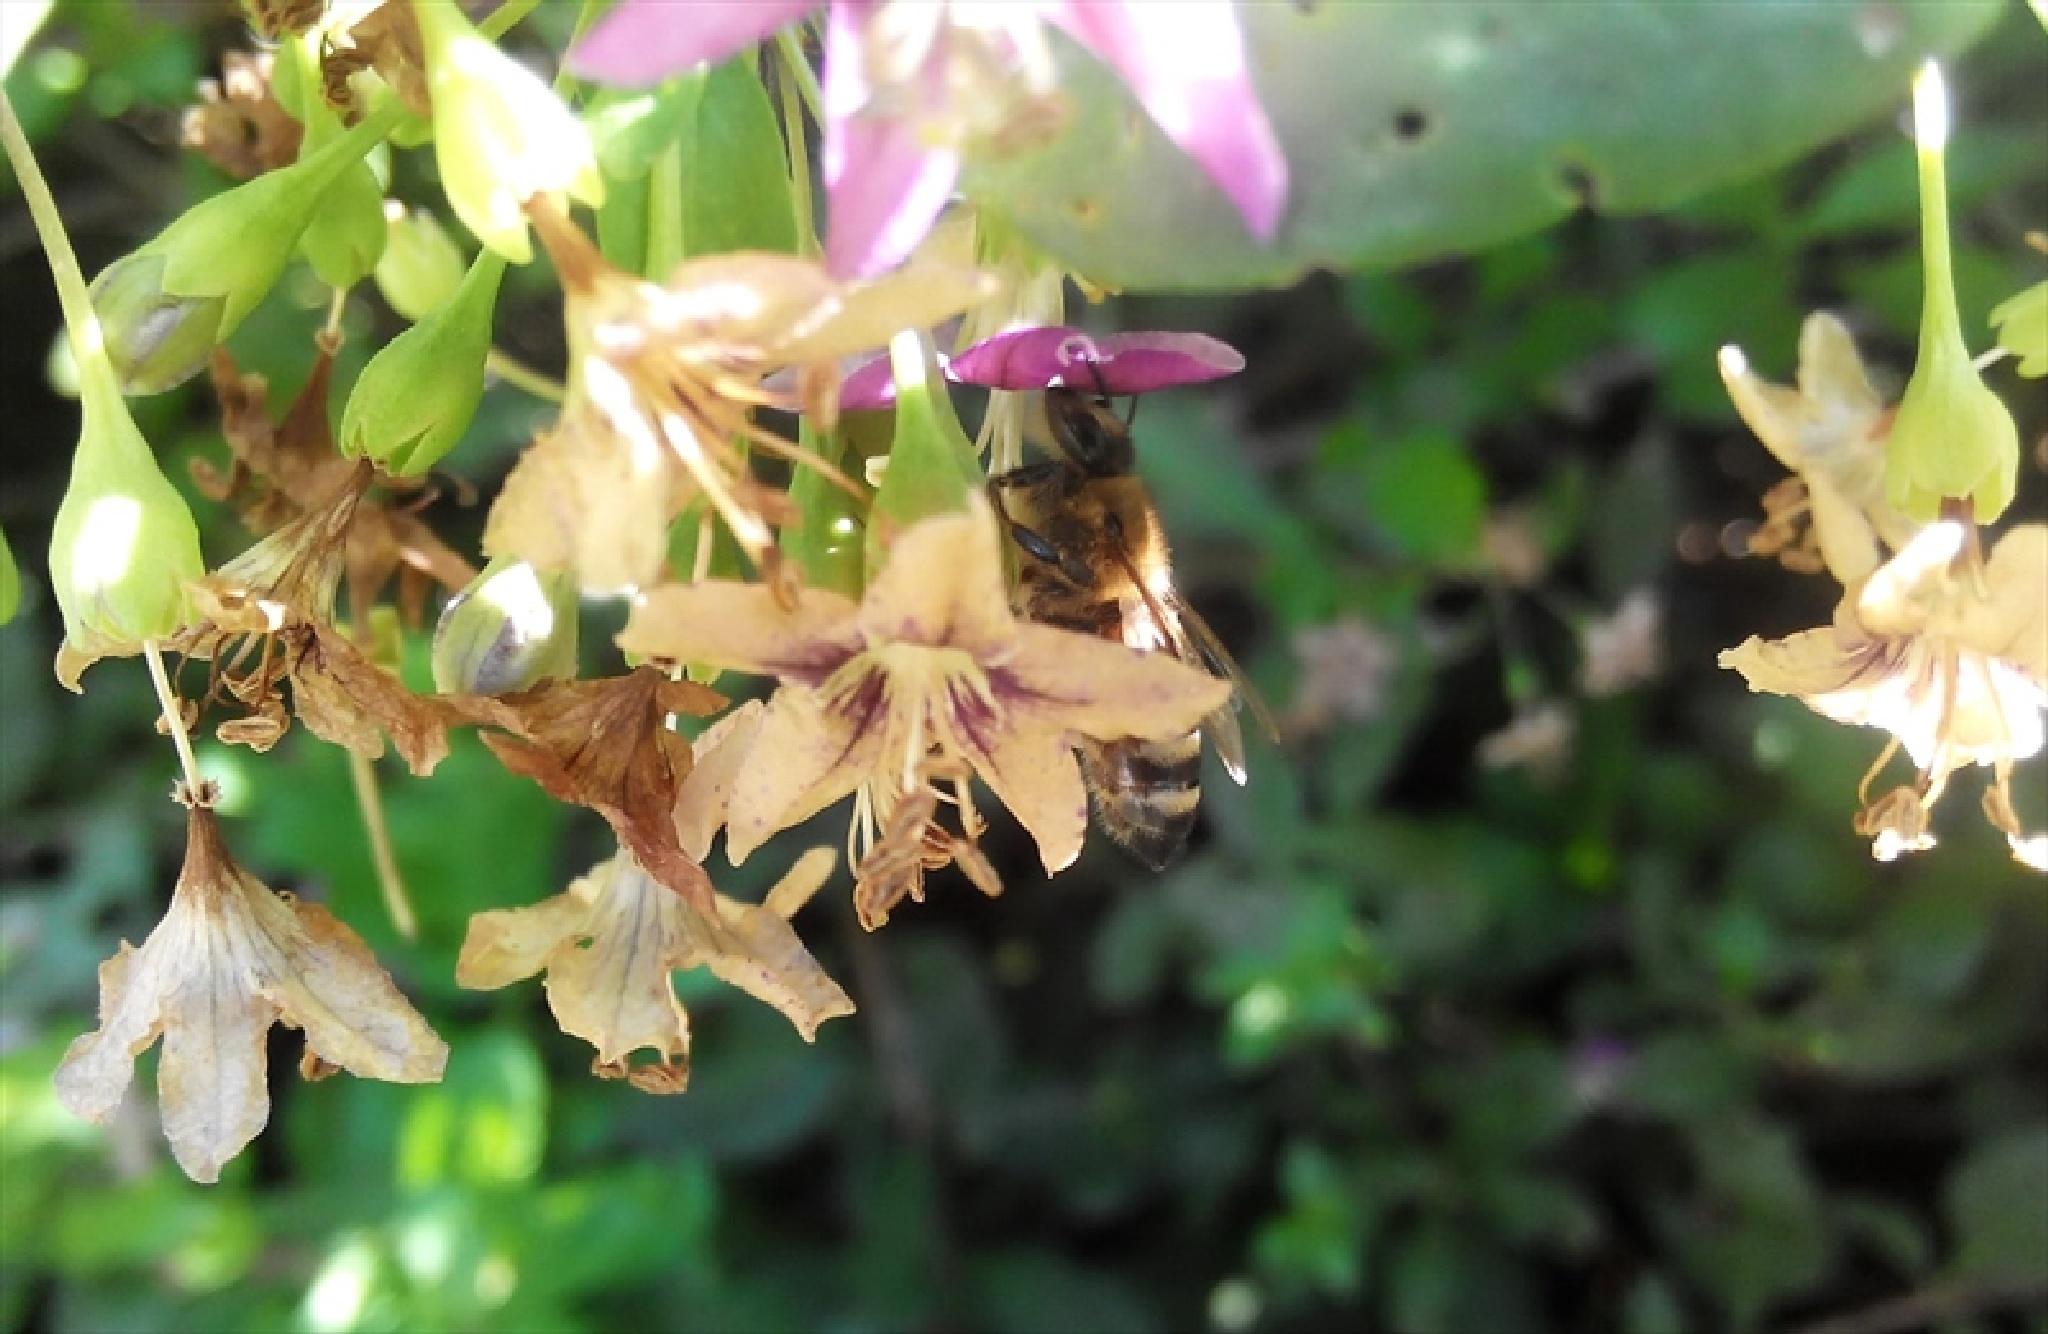 Working bee by ShumenBulgaria